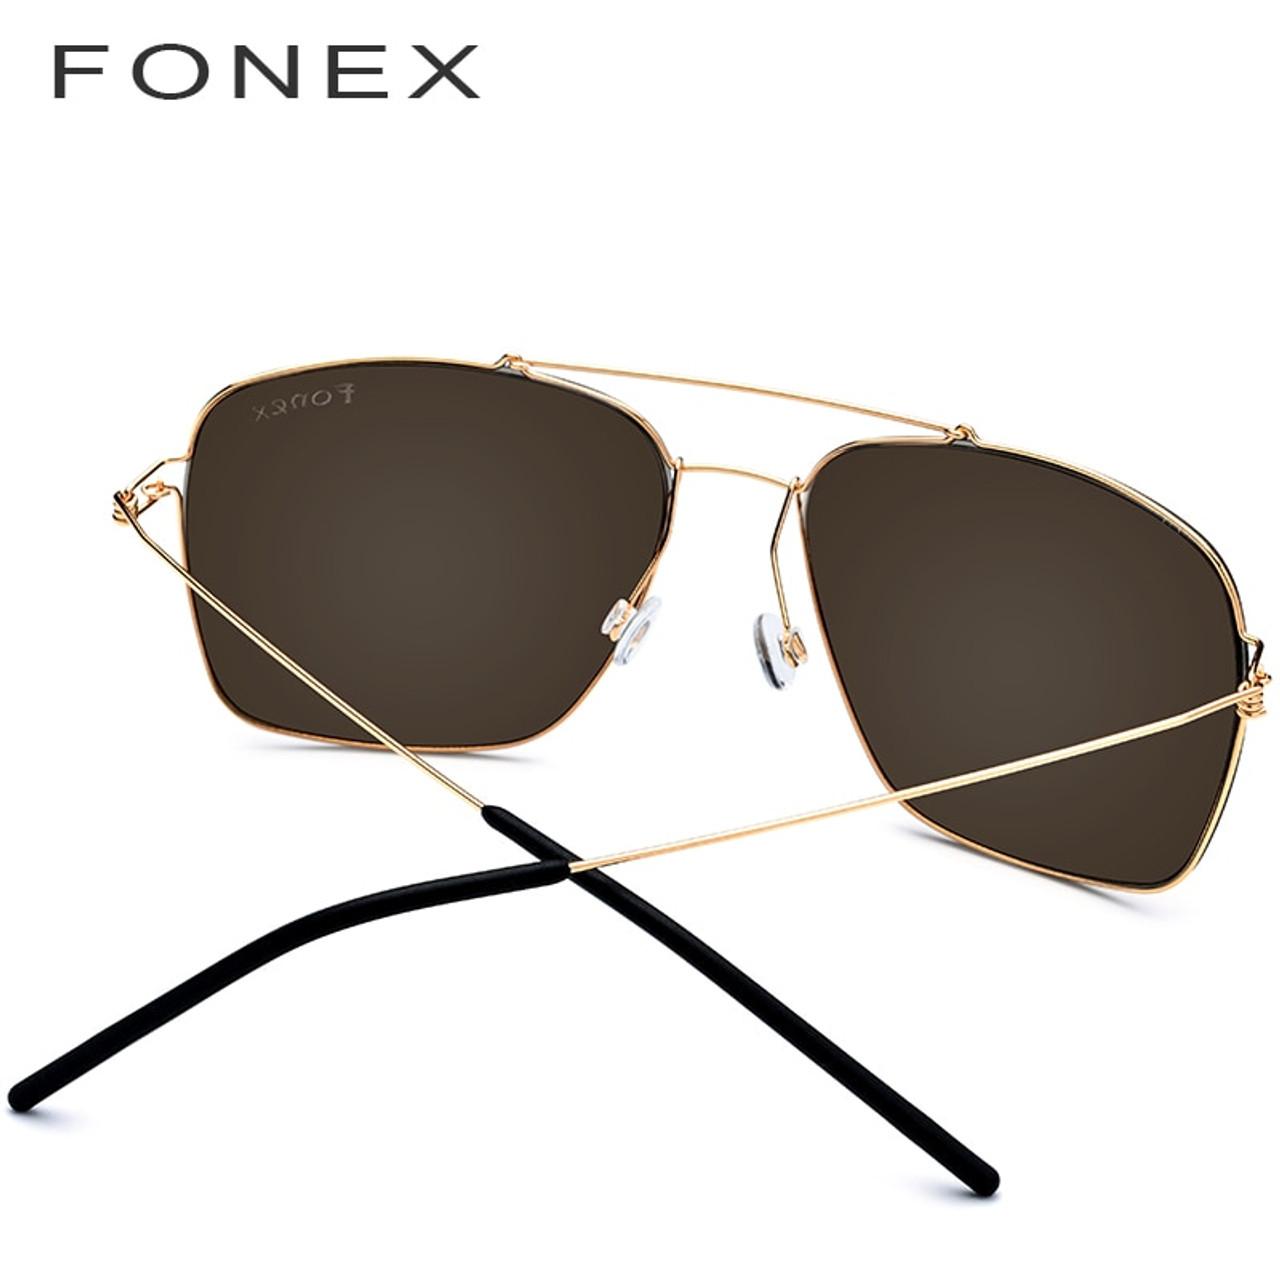 dee600e4cfc ... FONEX Polarized Sunglasses Men Ultralight 2019 Brand Design Mirror  Alloy Oversize Square Sun Glasses for Men ...